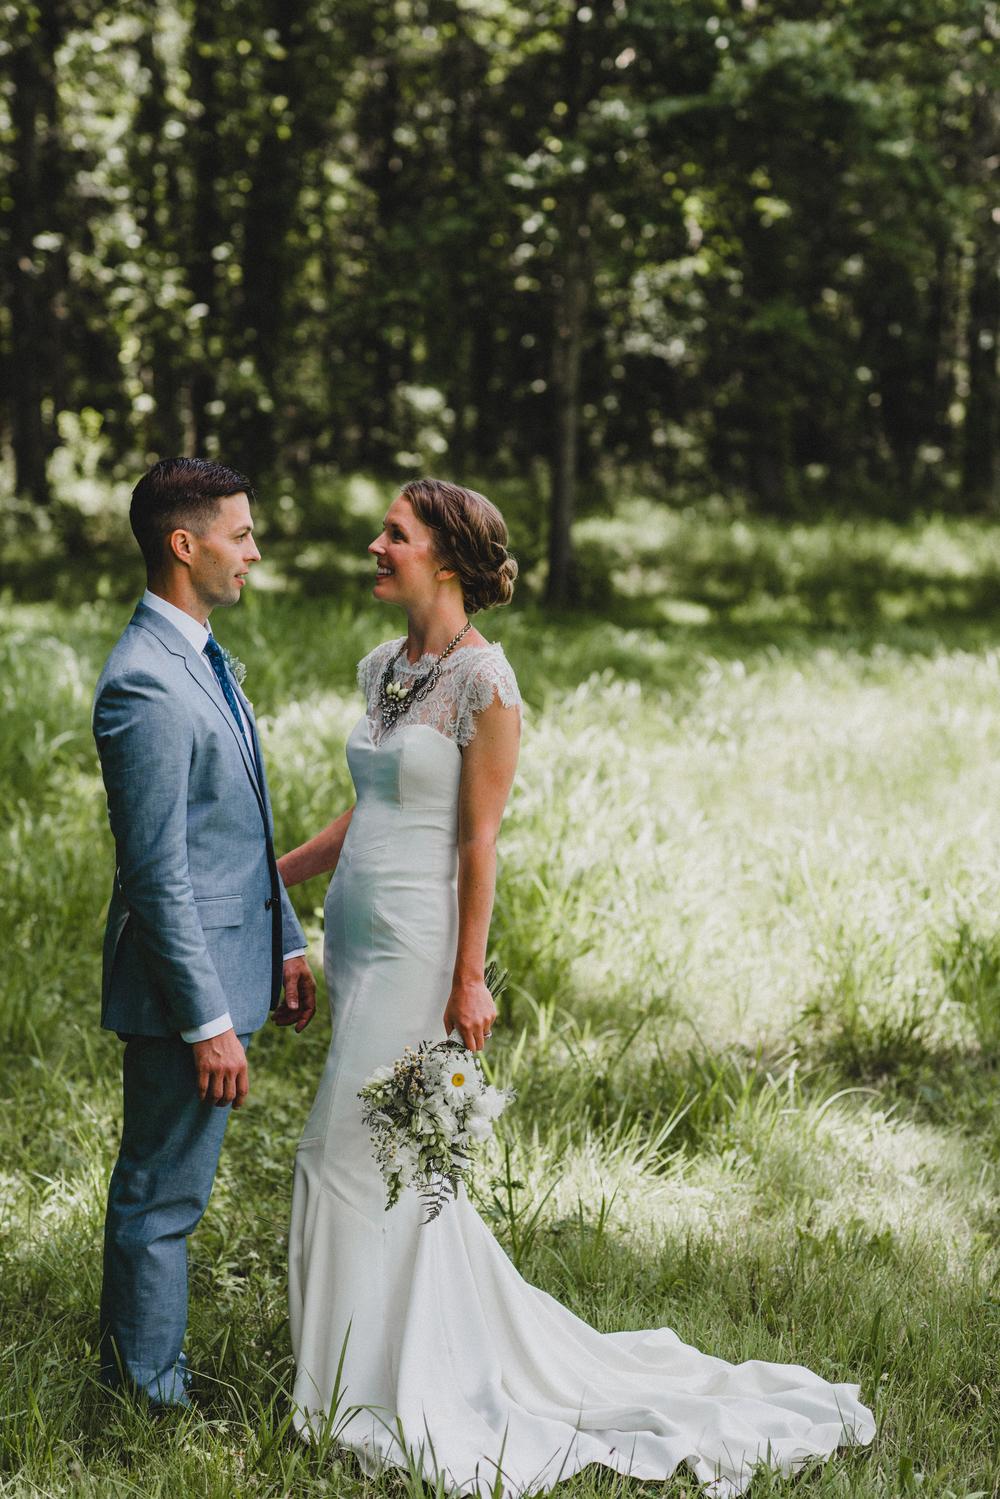 Intimate-Backyard-Farmhouse-Ohio-Wedding-Andi+Ben_Mallory+Justin-Photographers-75.JPG